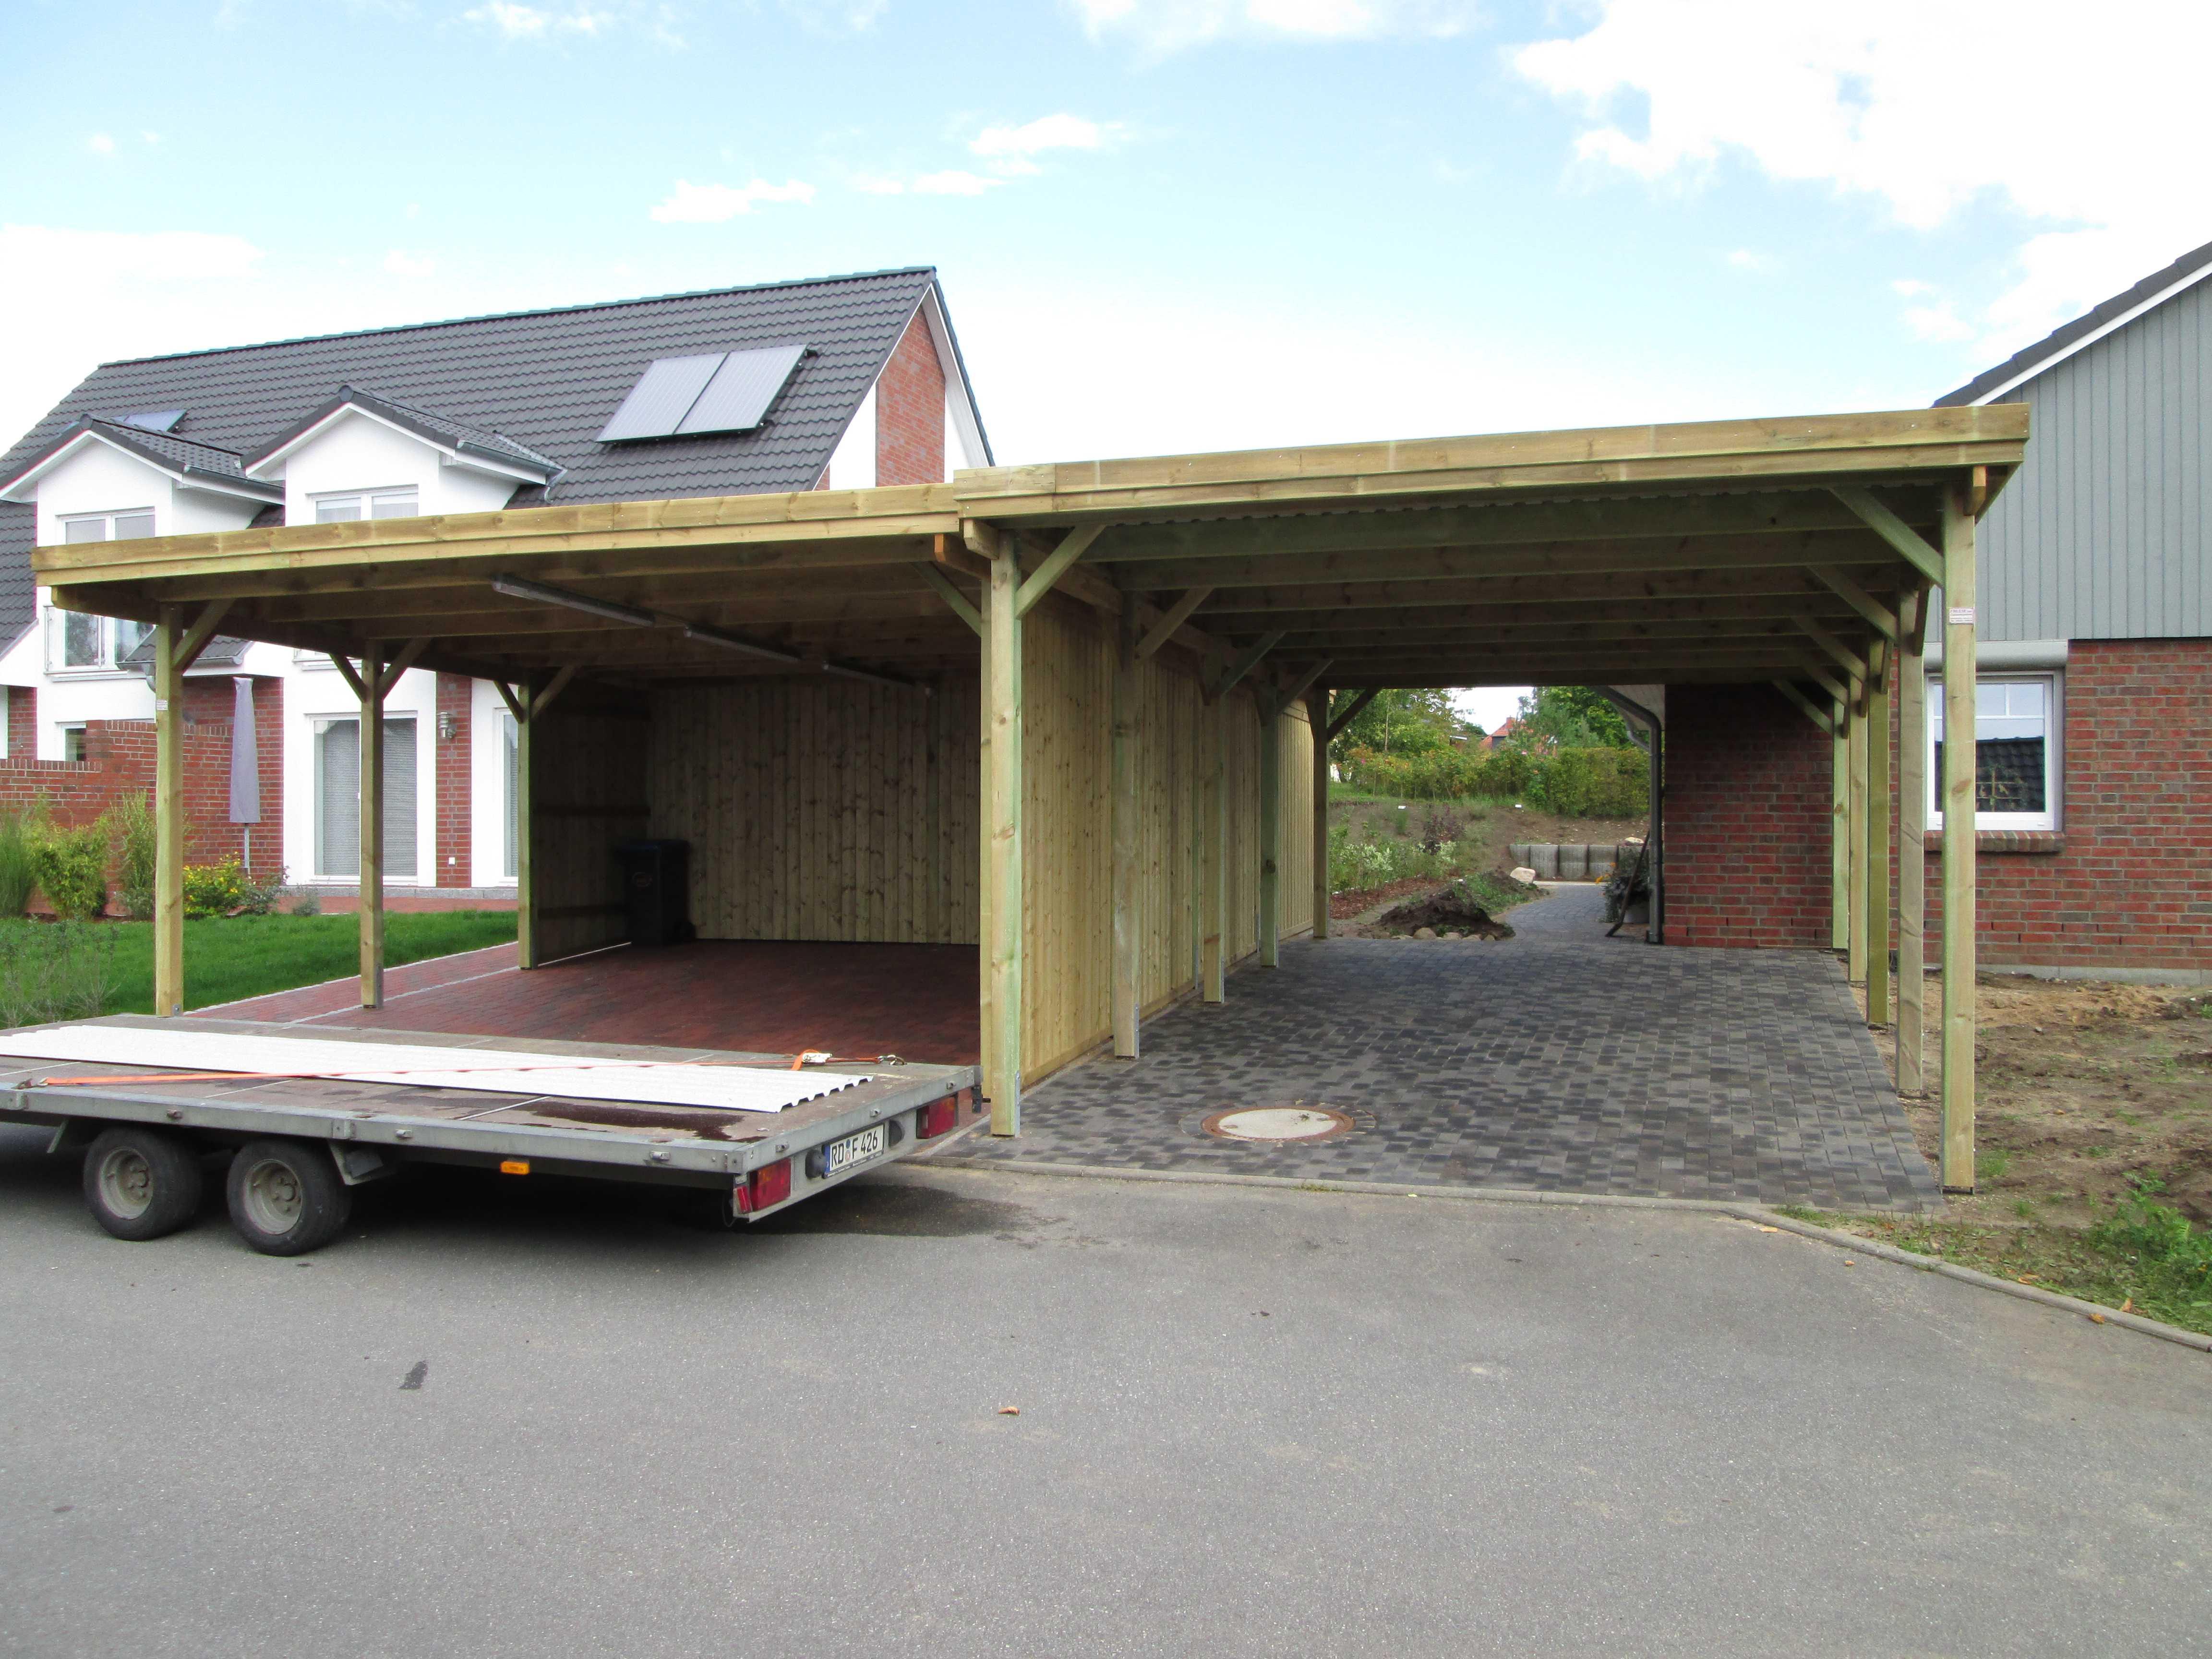 Carport KDI mit Flachdach, massiver Holz